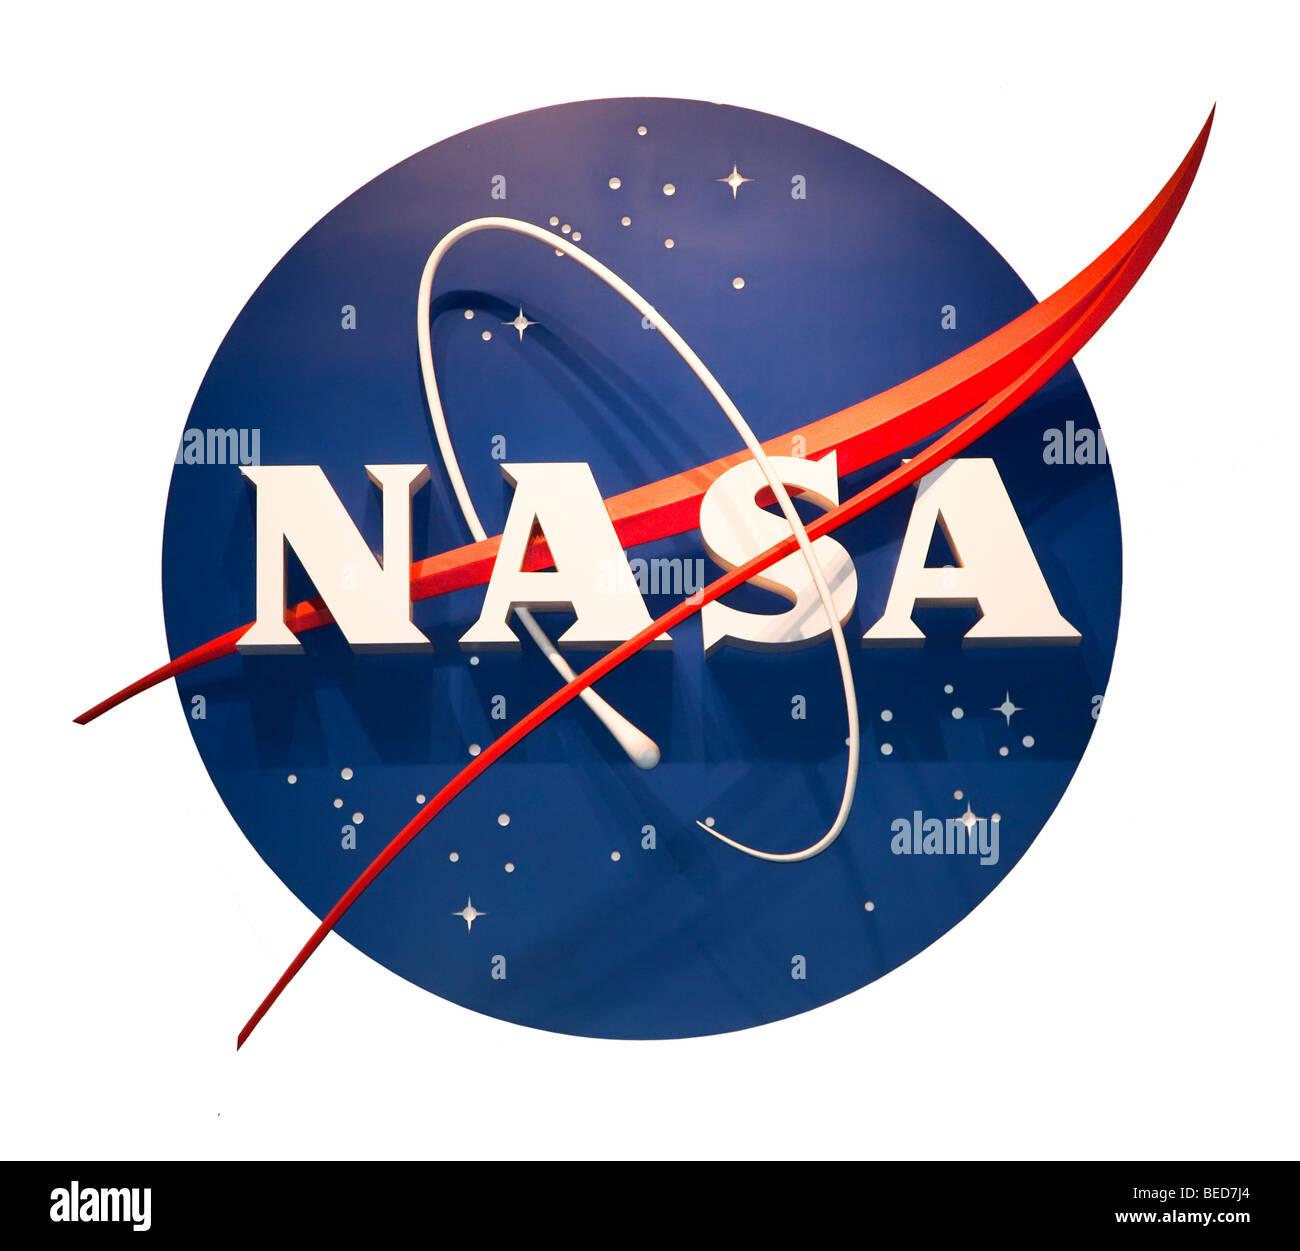 NASA logo at NASA Space Center Houston Texas USA - Stock Image